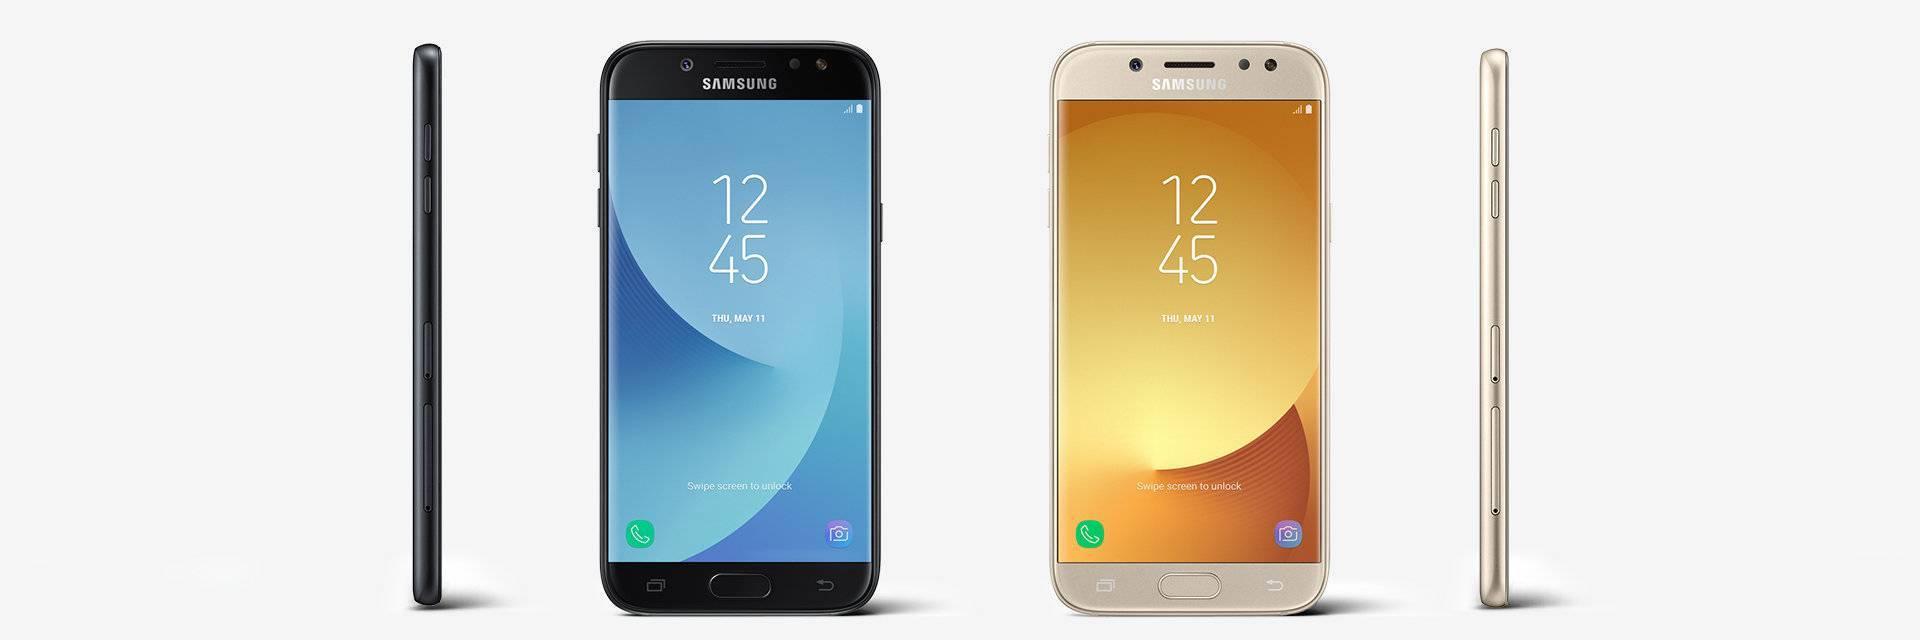 Smartfon SAMSUNG Galaxy J5 (2017) Dual SIM Czarny SM ...